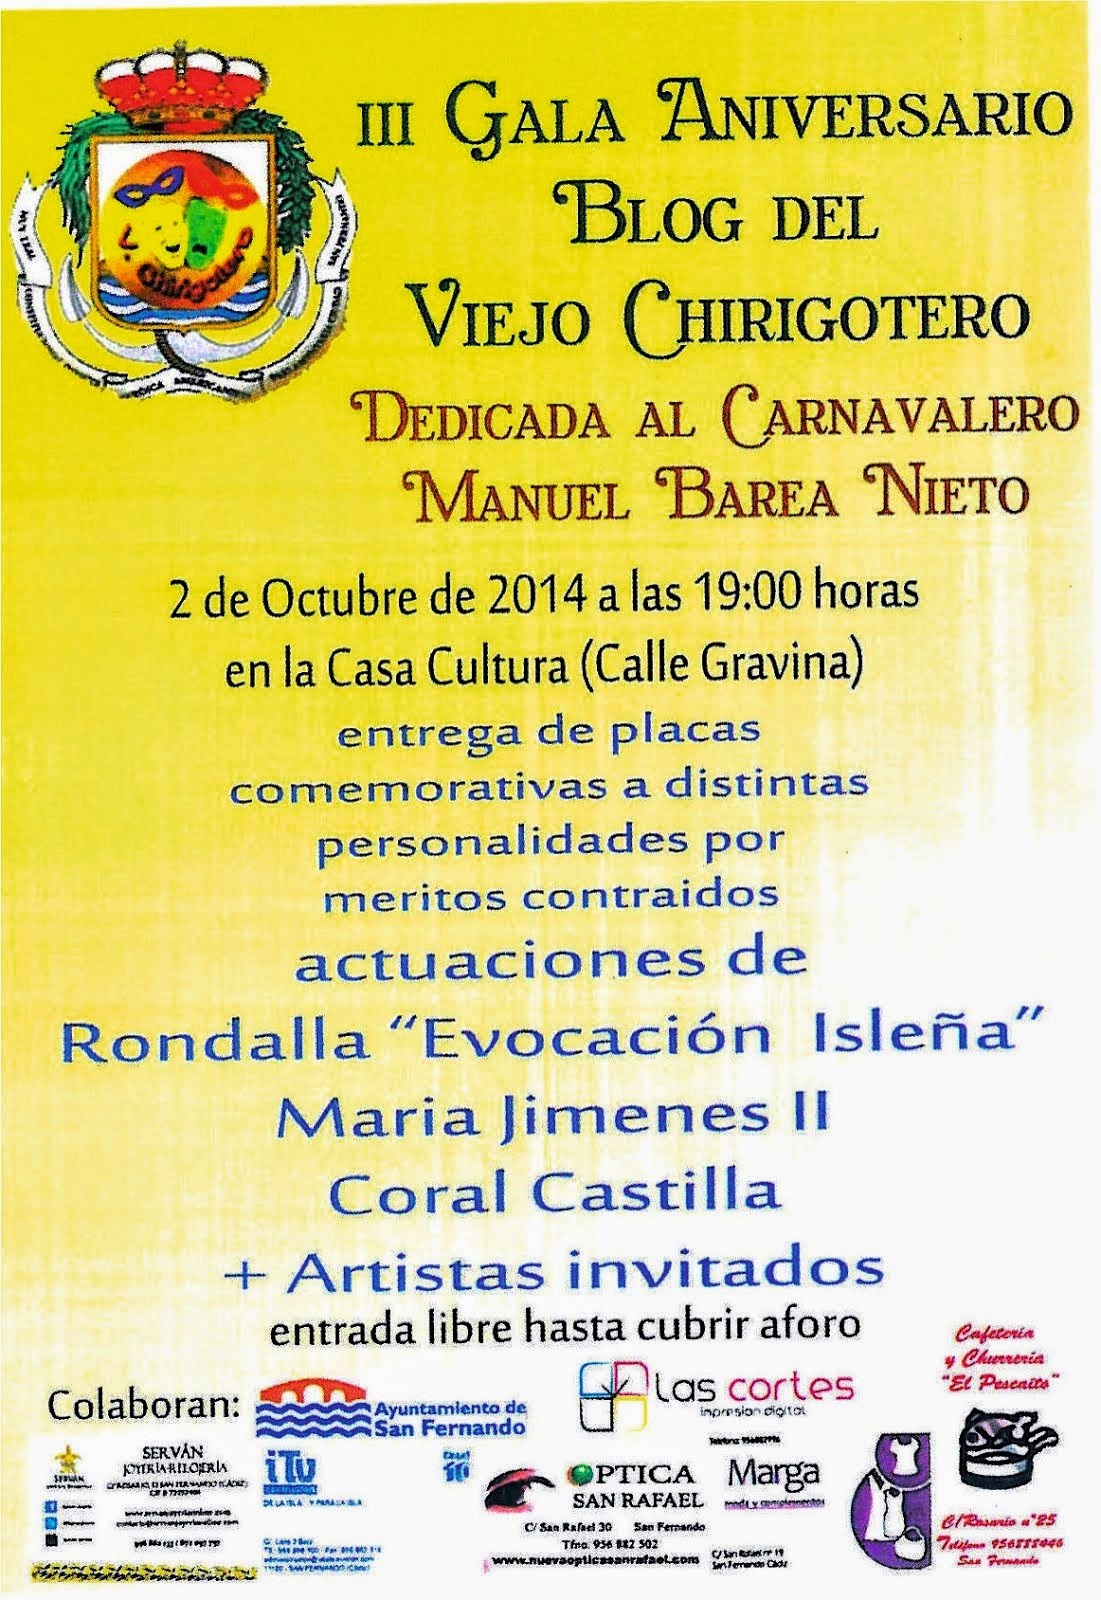 III Gala del Blog Viejo Chirigotero